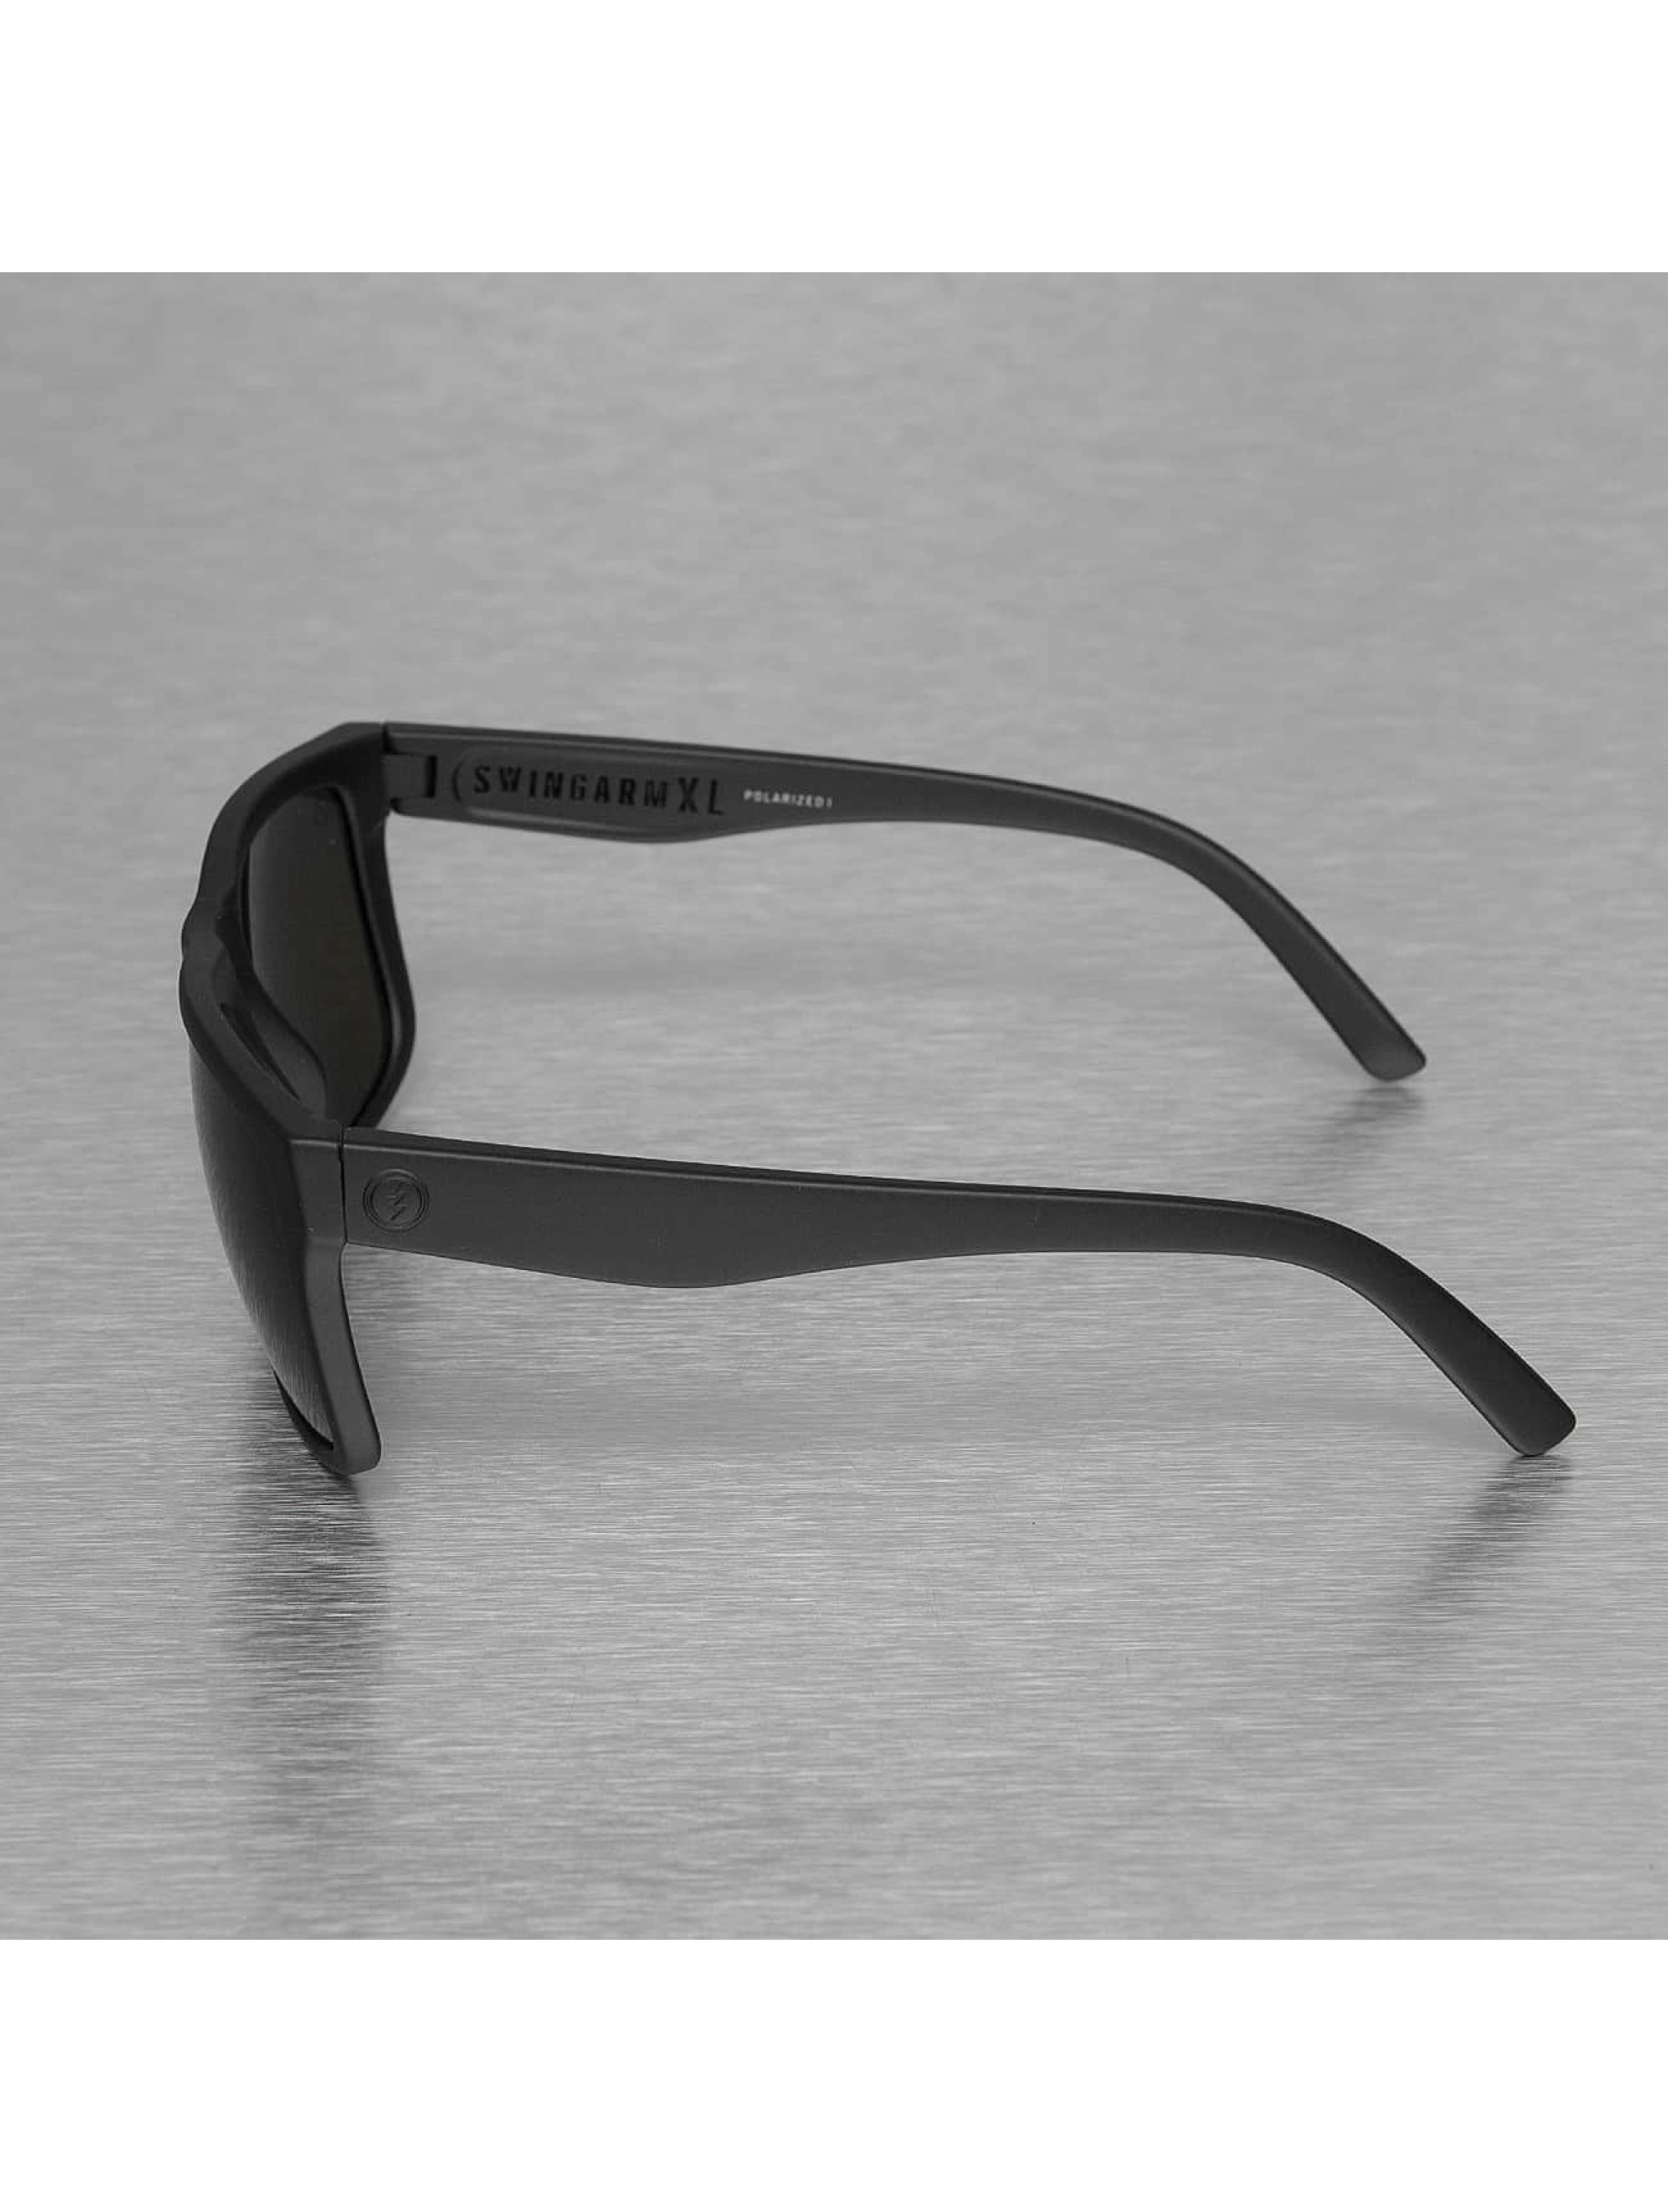 Electric Sunglasses SWINGARM XL Polarized black